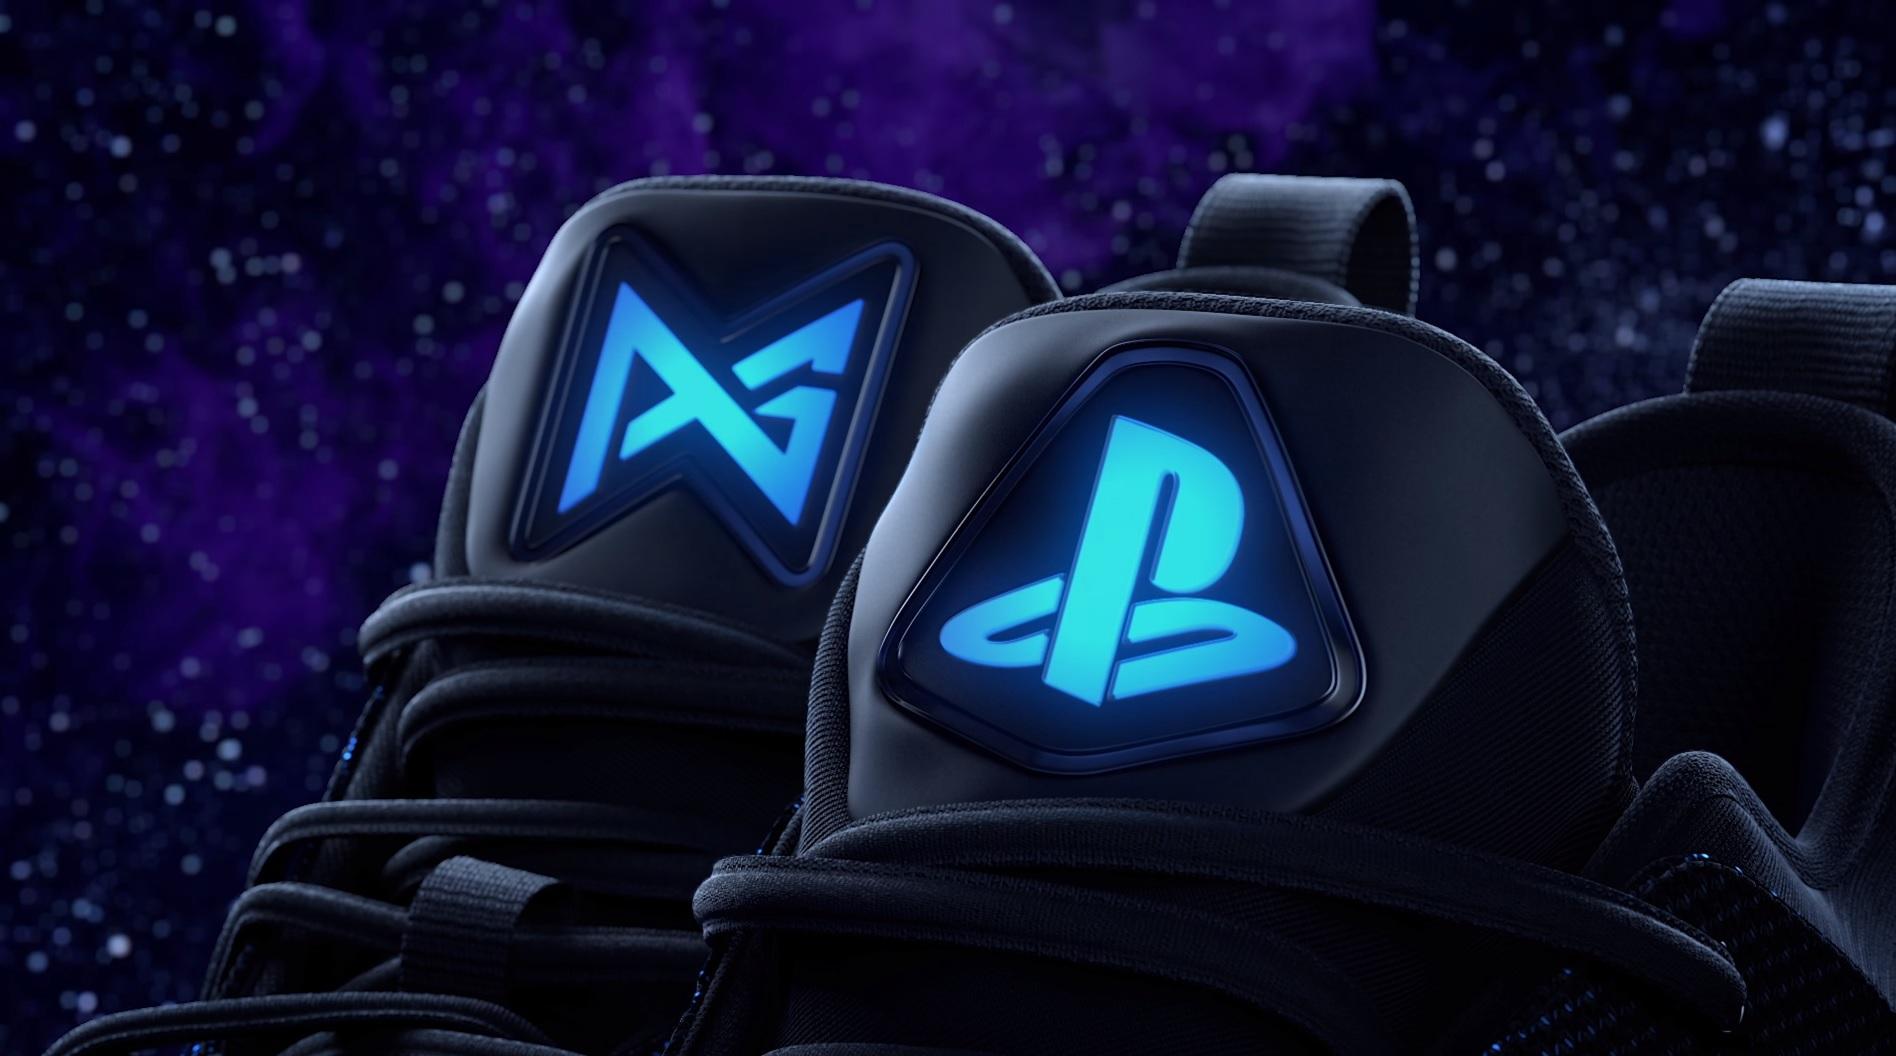 6845cba540b903 Unboxing-Video zum offiziellen PlayStation-Sneaker  Nike PG2 PlayStation  Colorway - play3.de